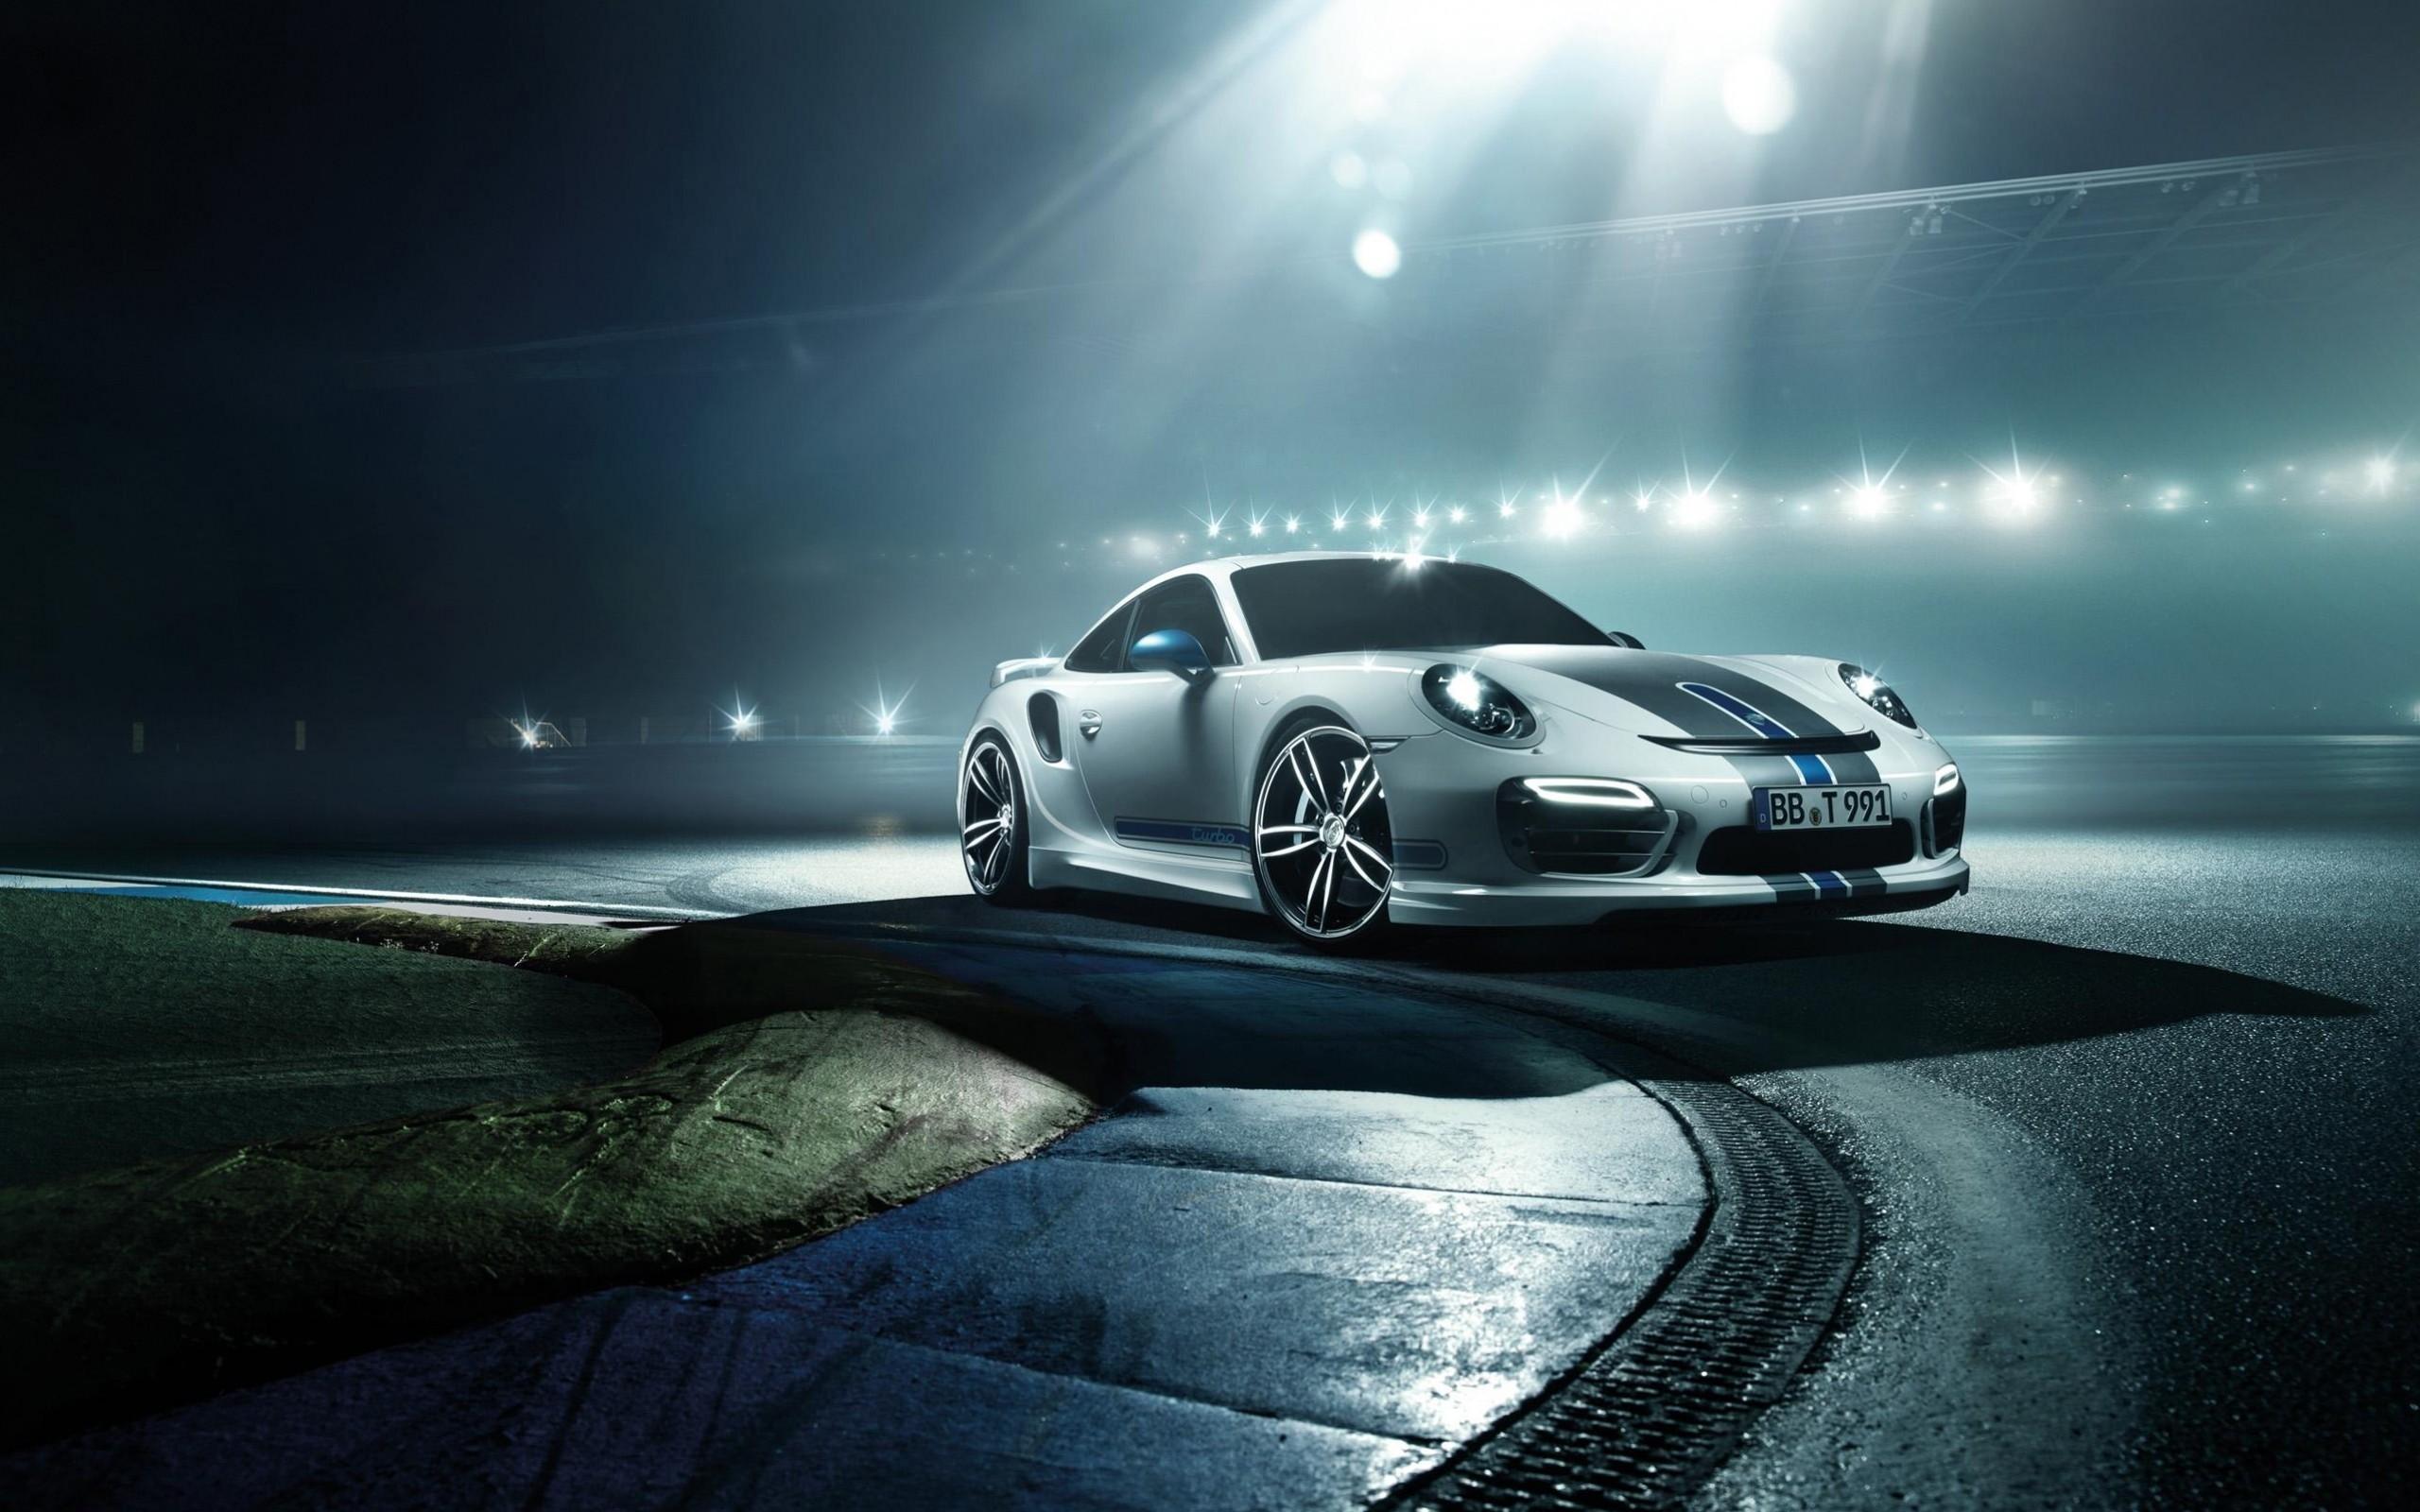 2014 Porsche 911 Turbo By Techart Mac wallpaper